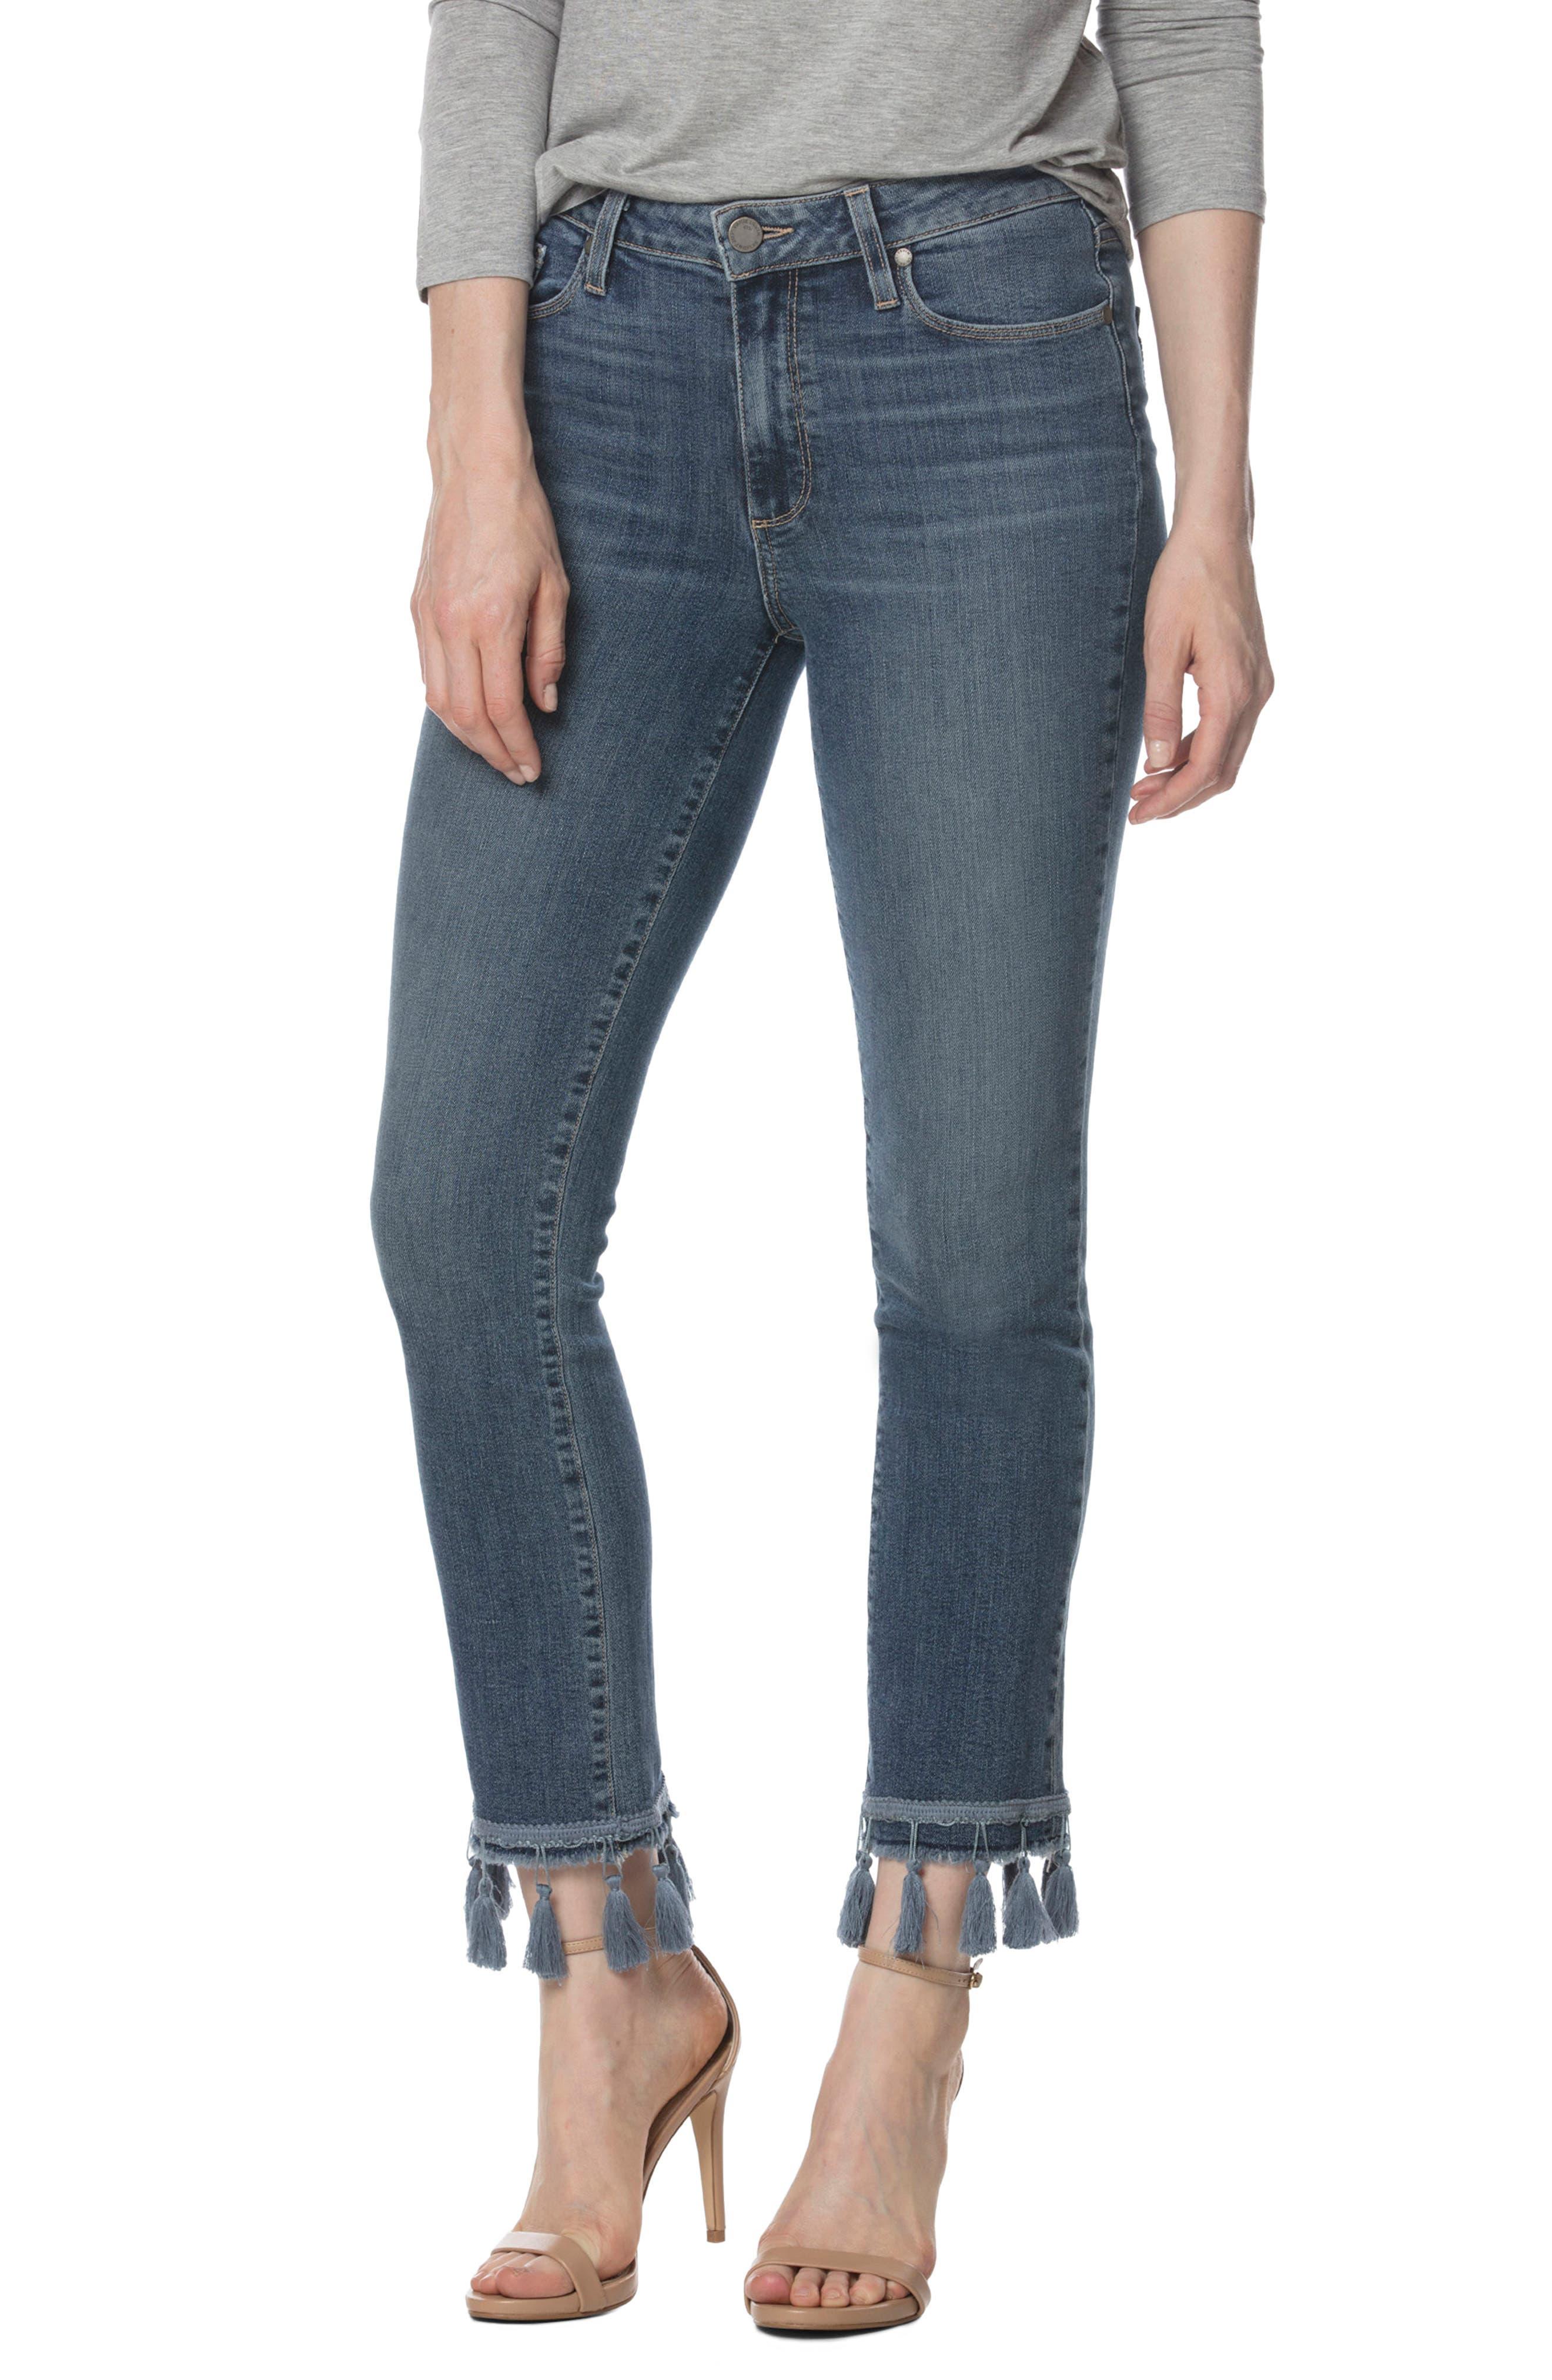 PAGE Jacqueline High Waist Ankle Straight Leg Jeans (Indigo Tassel)